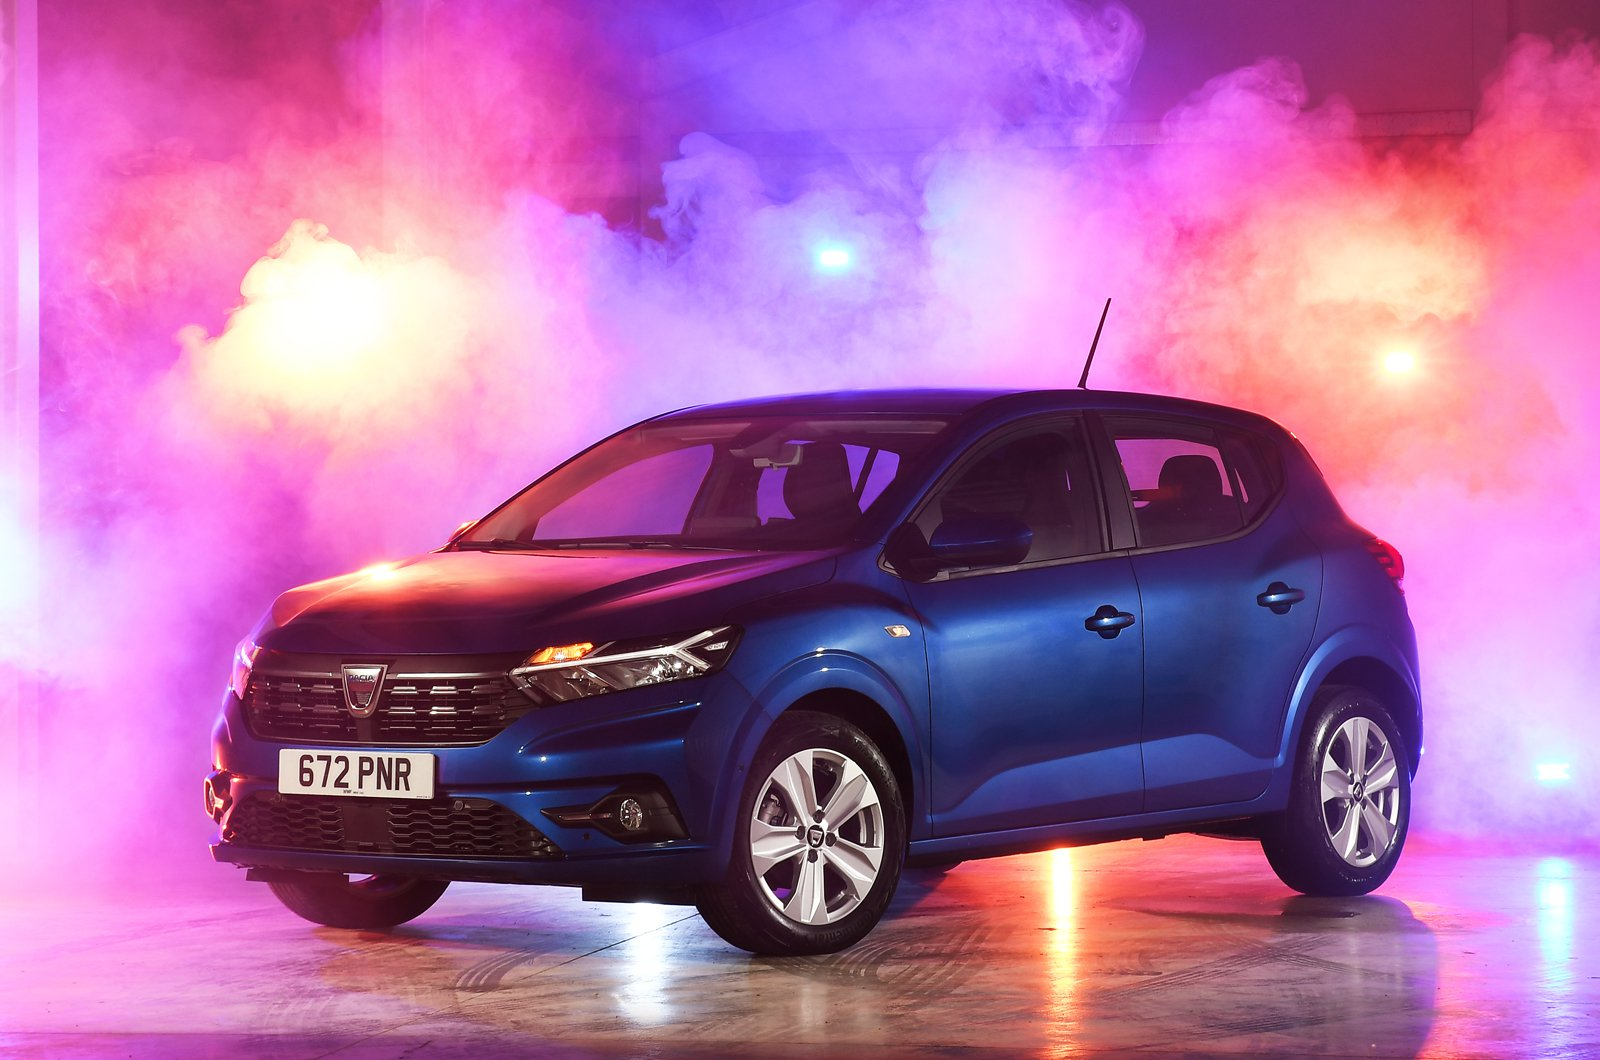 Car of the Year 2021 - Dacia Sandero